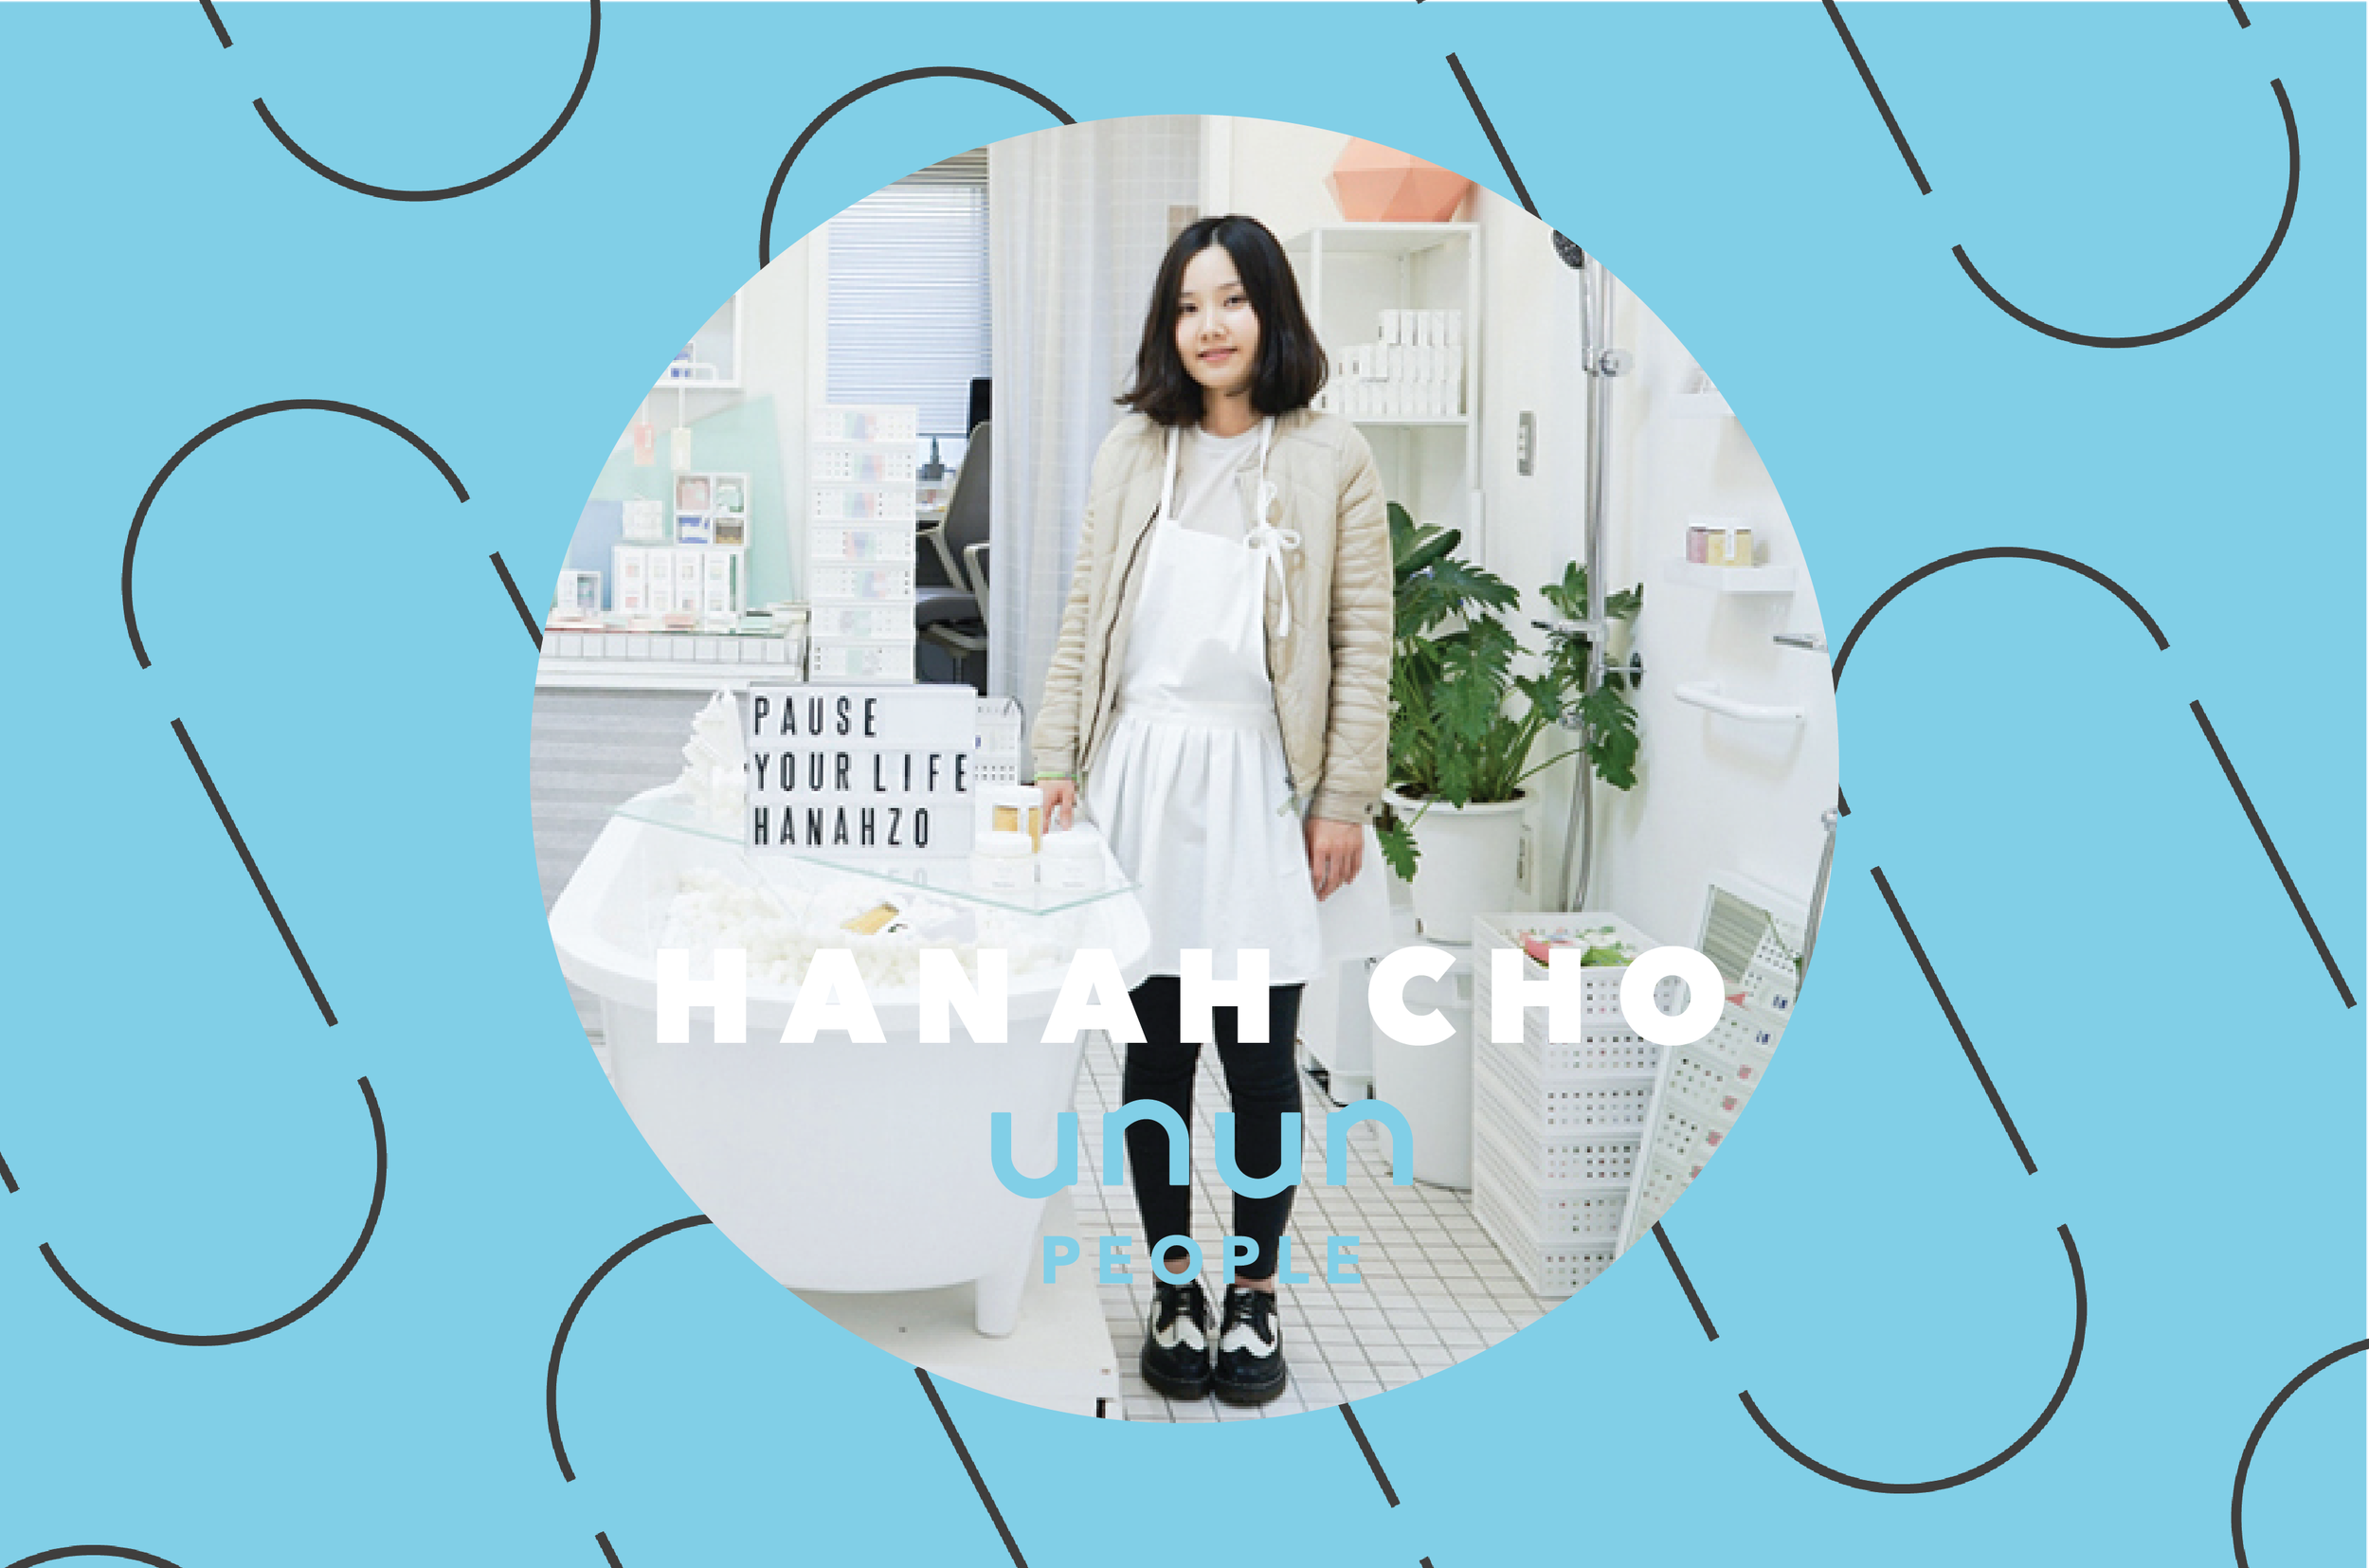 Hanahzo  Designer & Soap Crafter